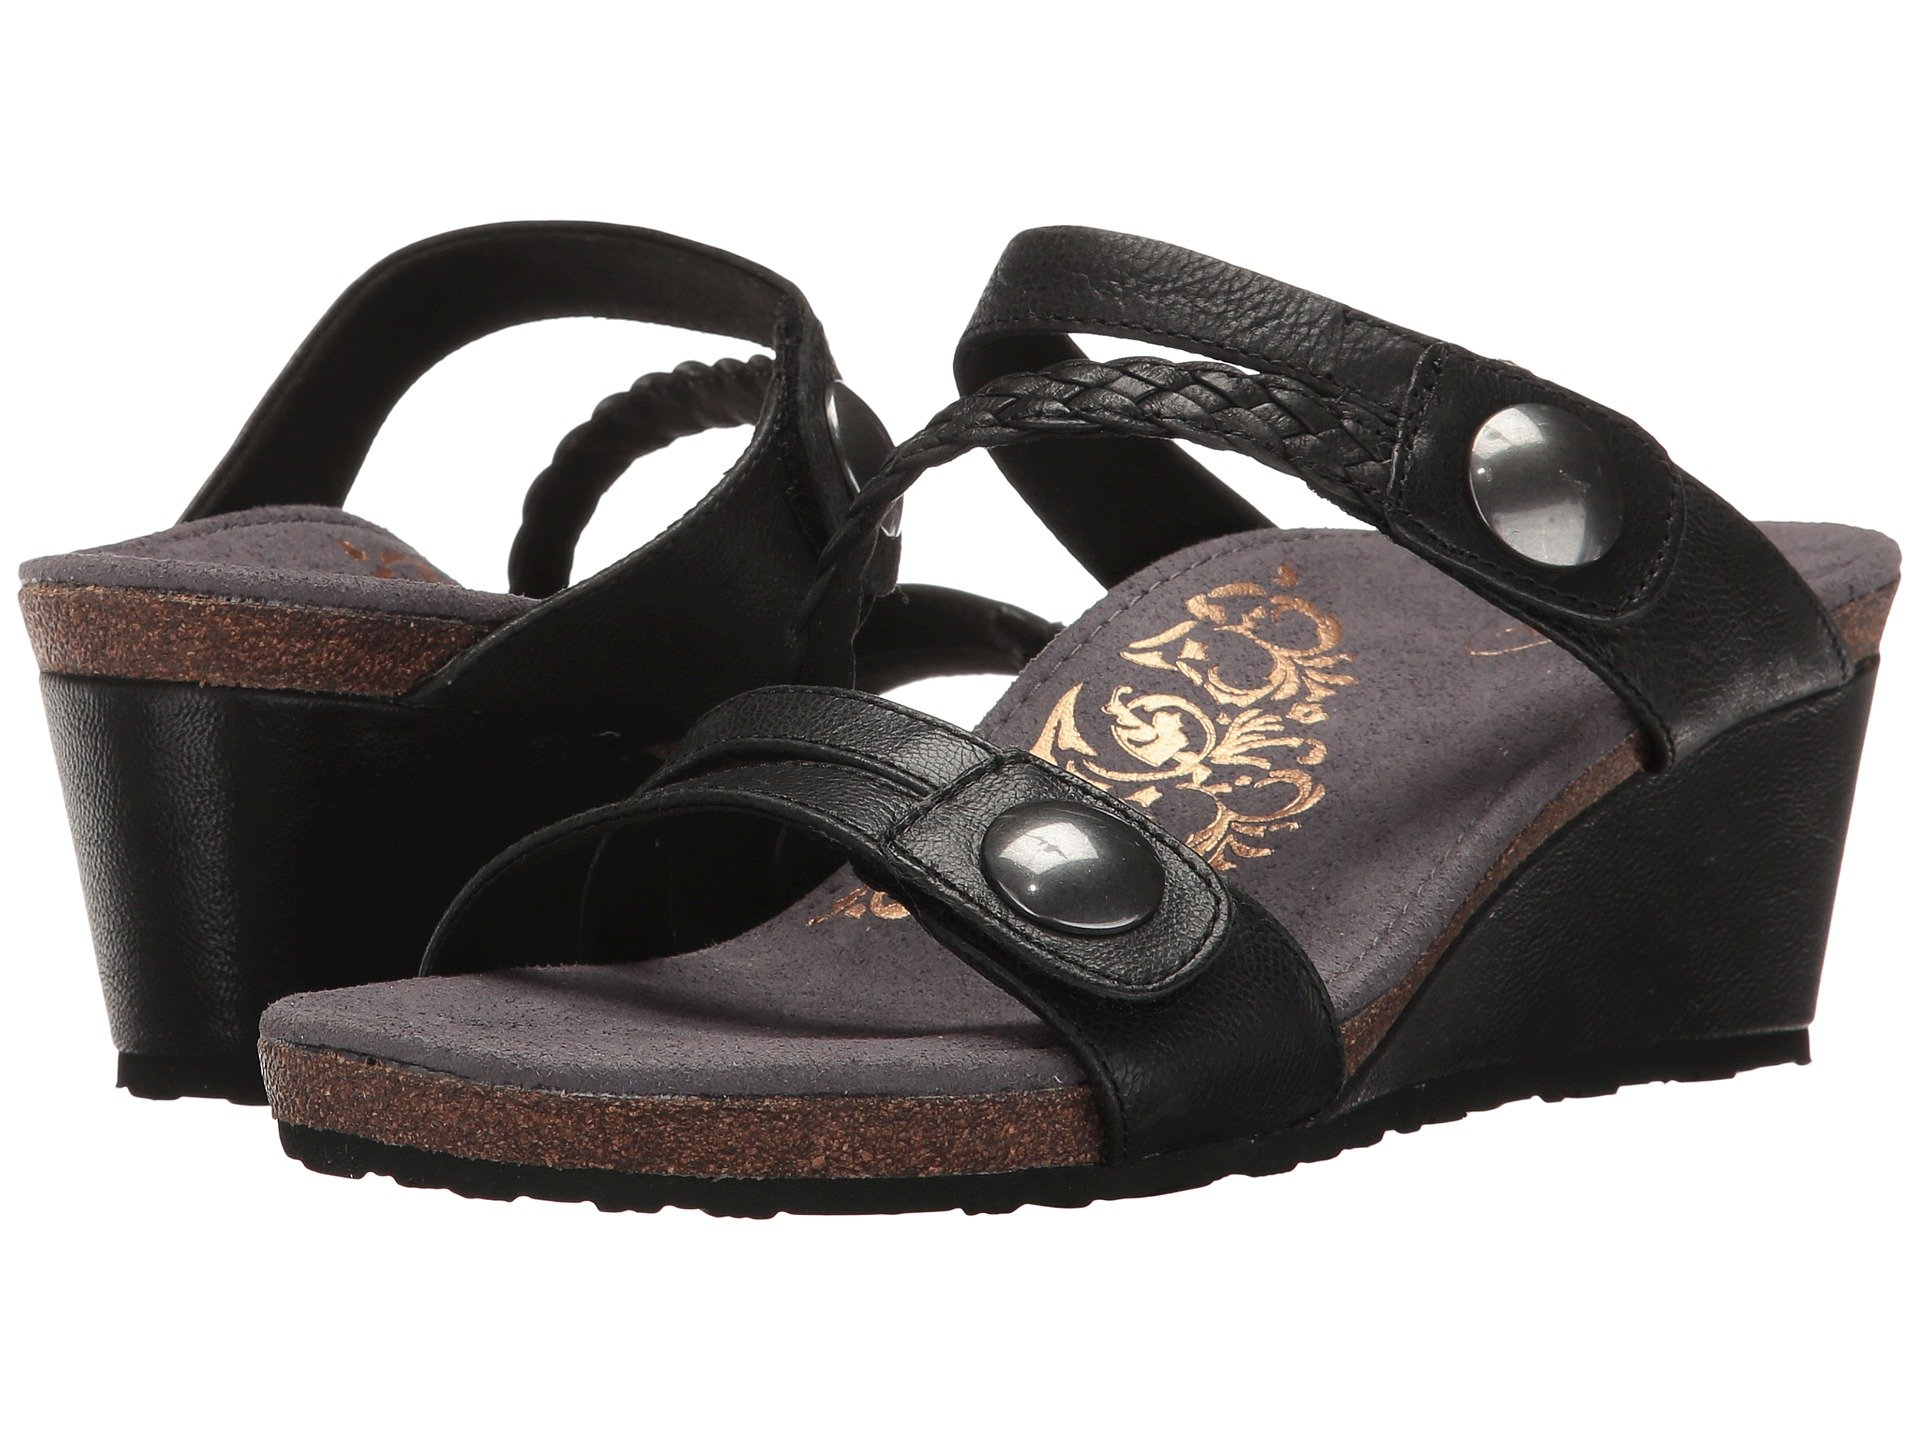 87f32a0875d4 Women s Aetrex Sandals + FREE SHIPPING